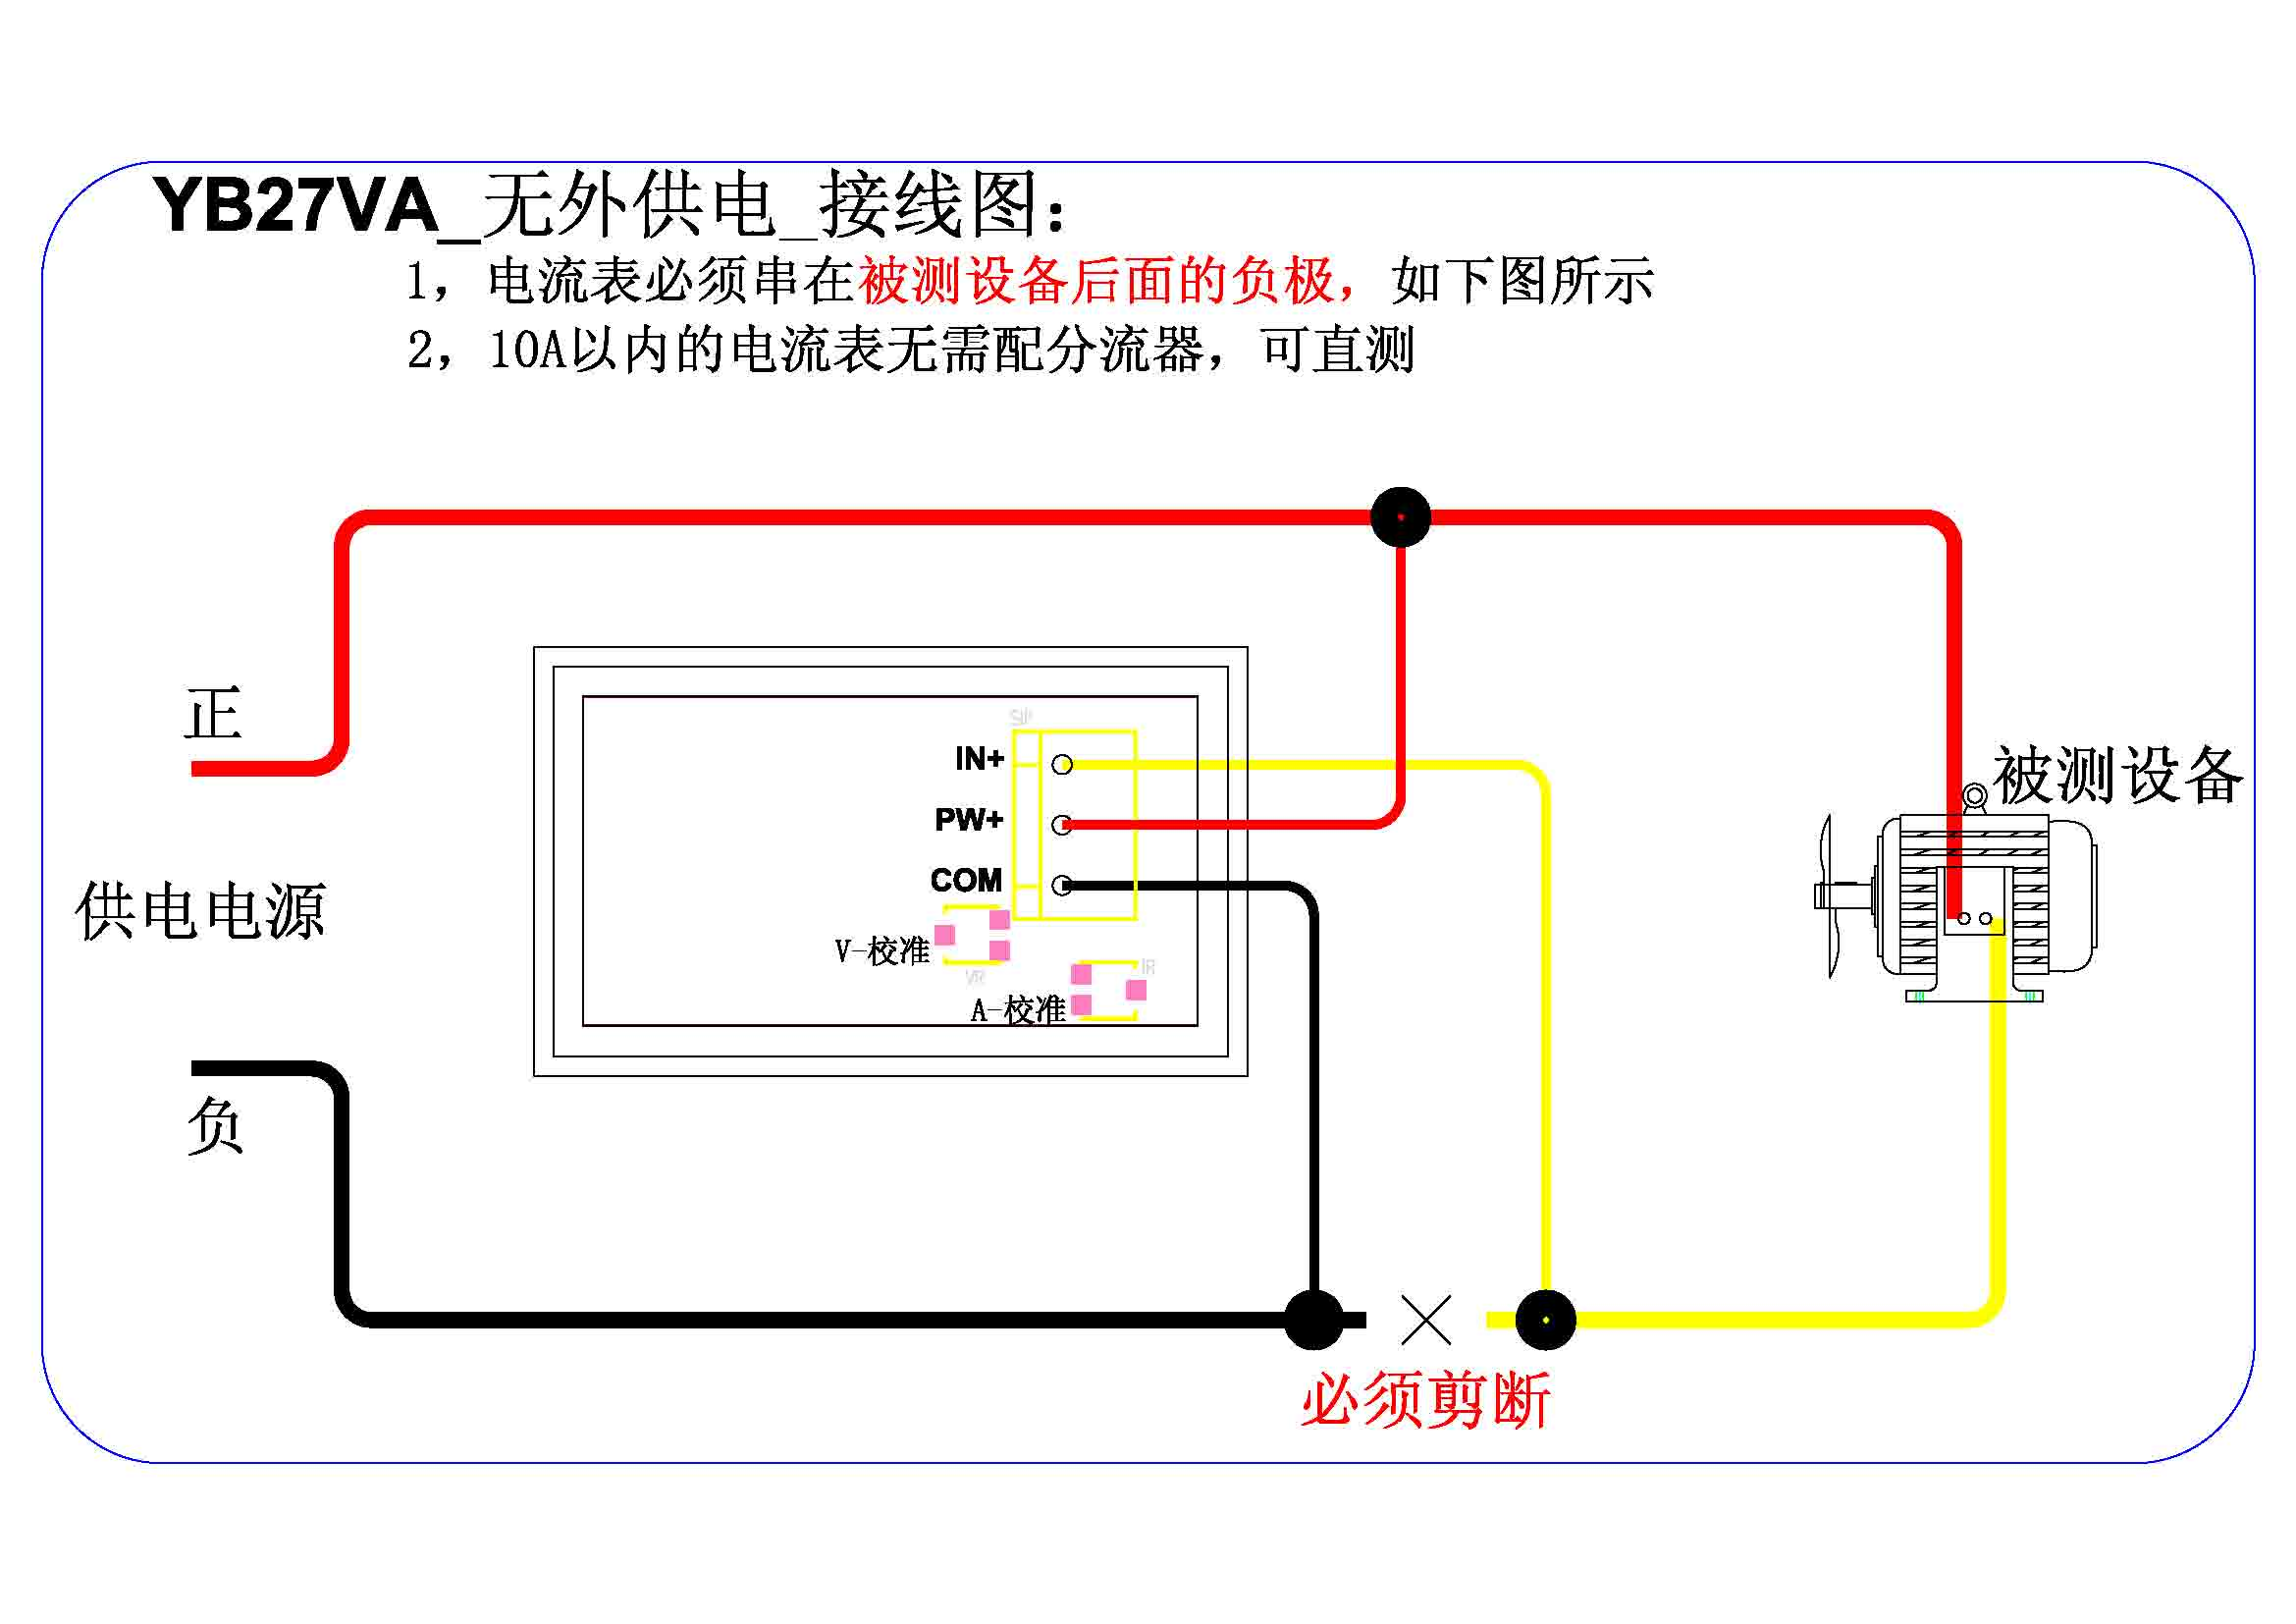 wiring diagram for automotive voltmeter spider tool yb27va third line dc digital ammeter head double